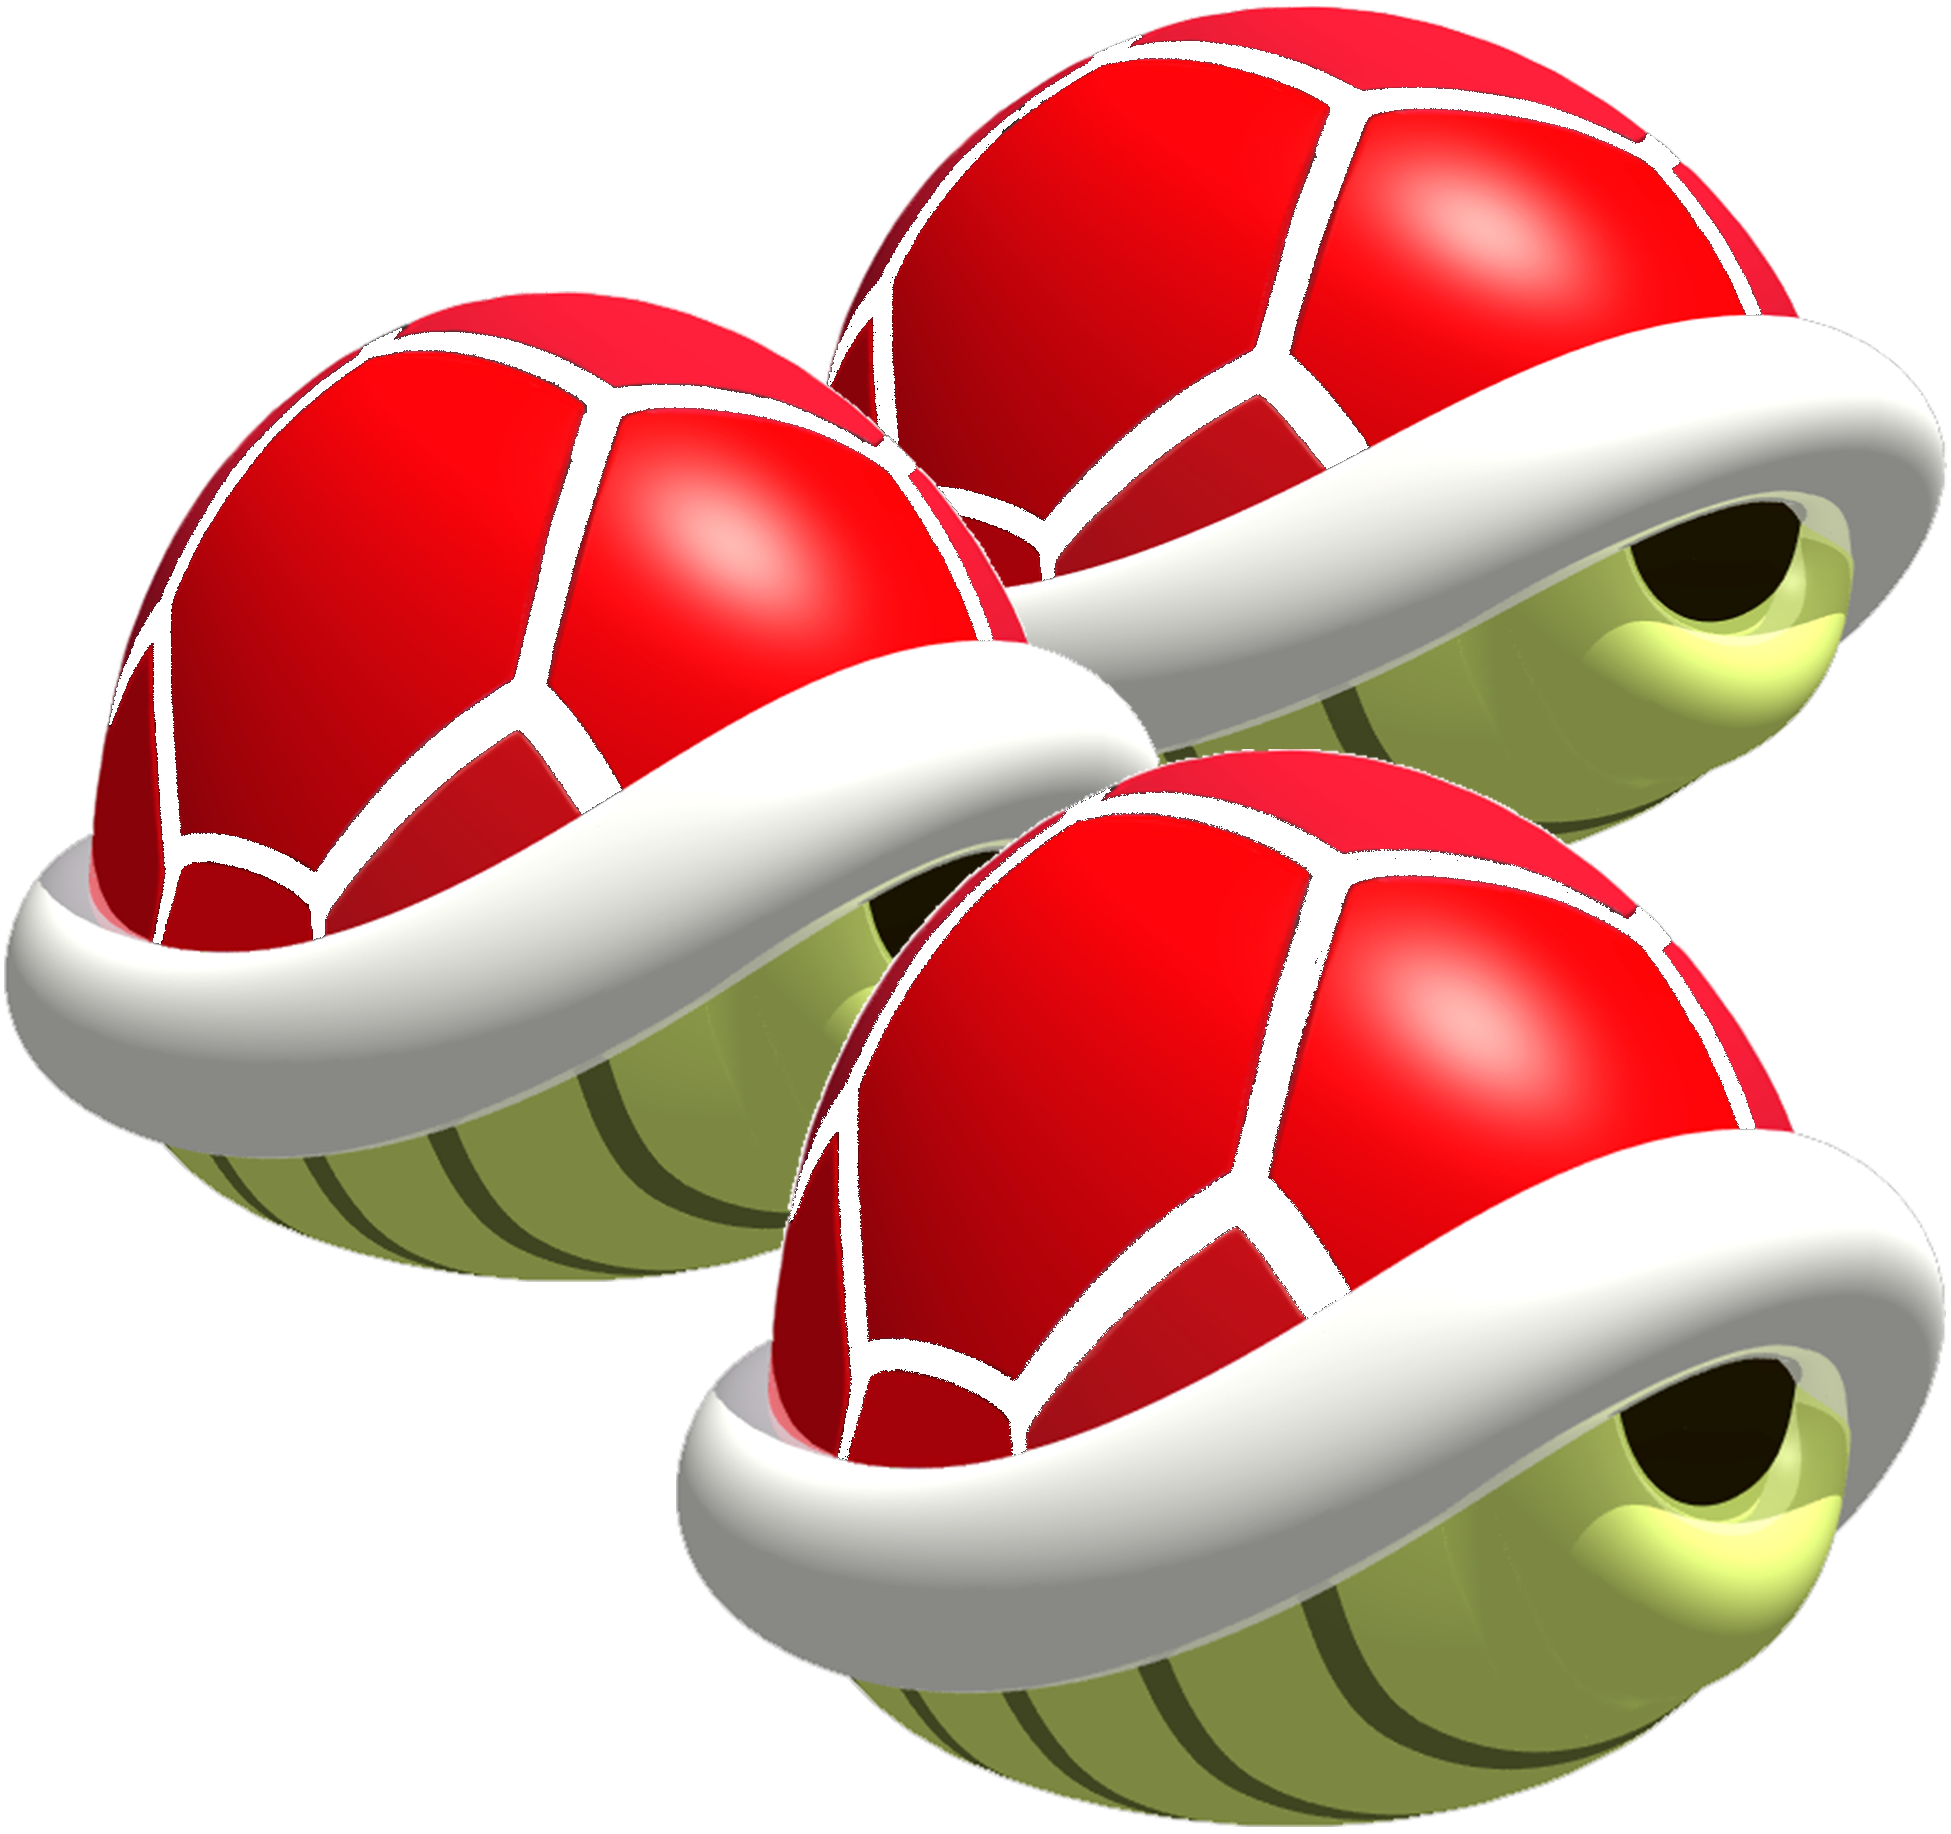 Playdough clipart red. Image triple shells mario